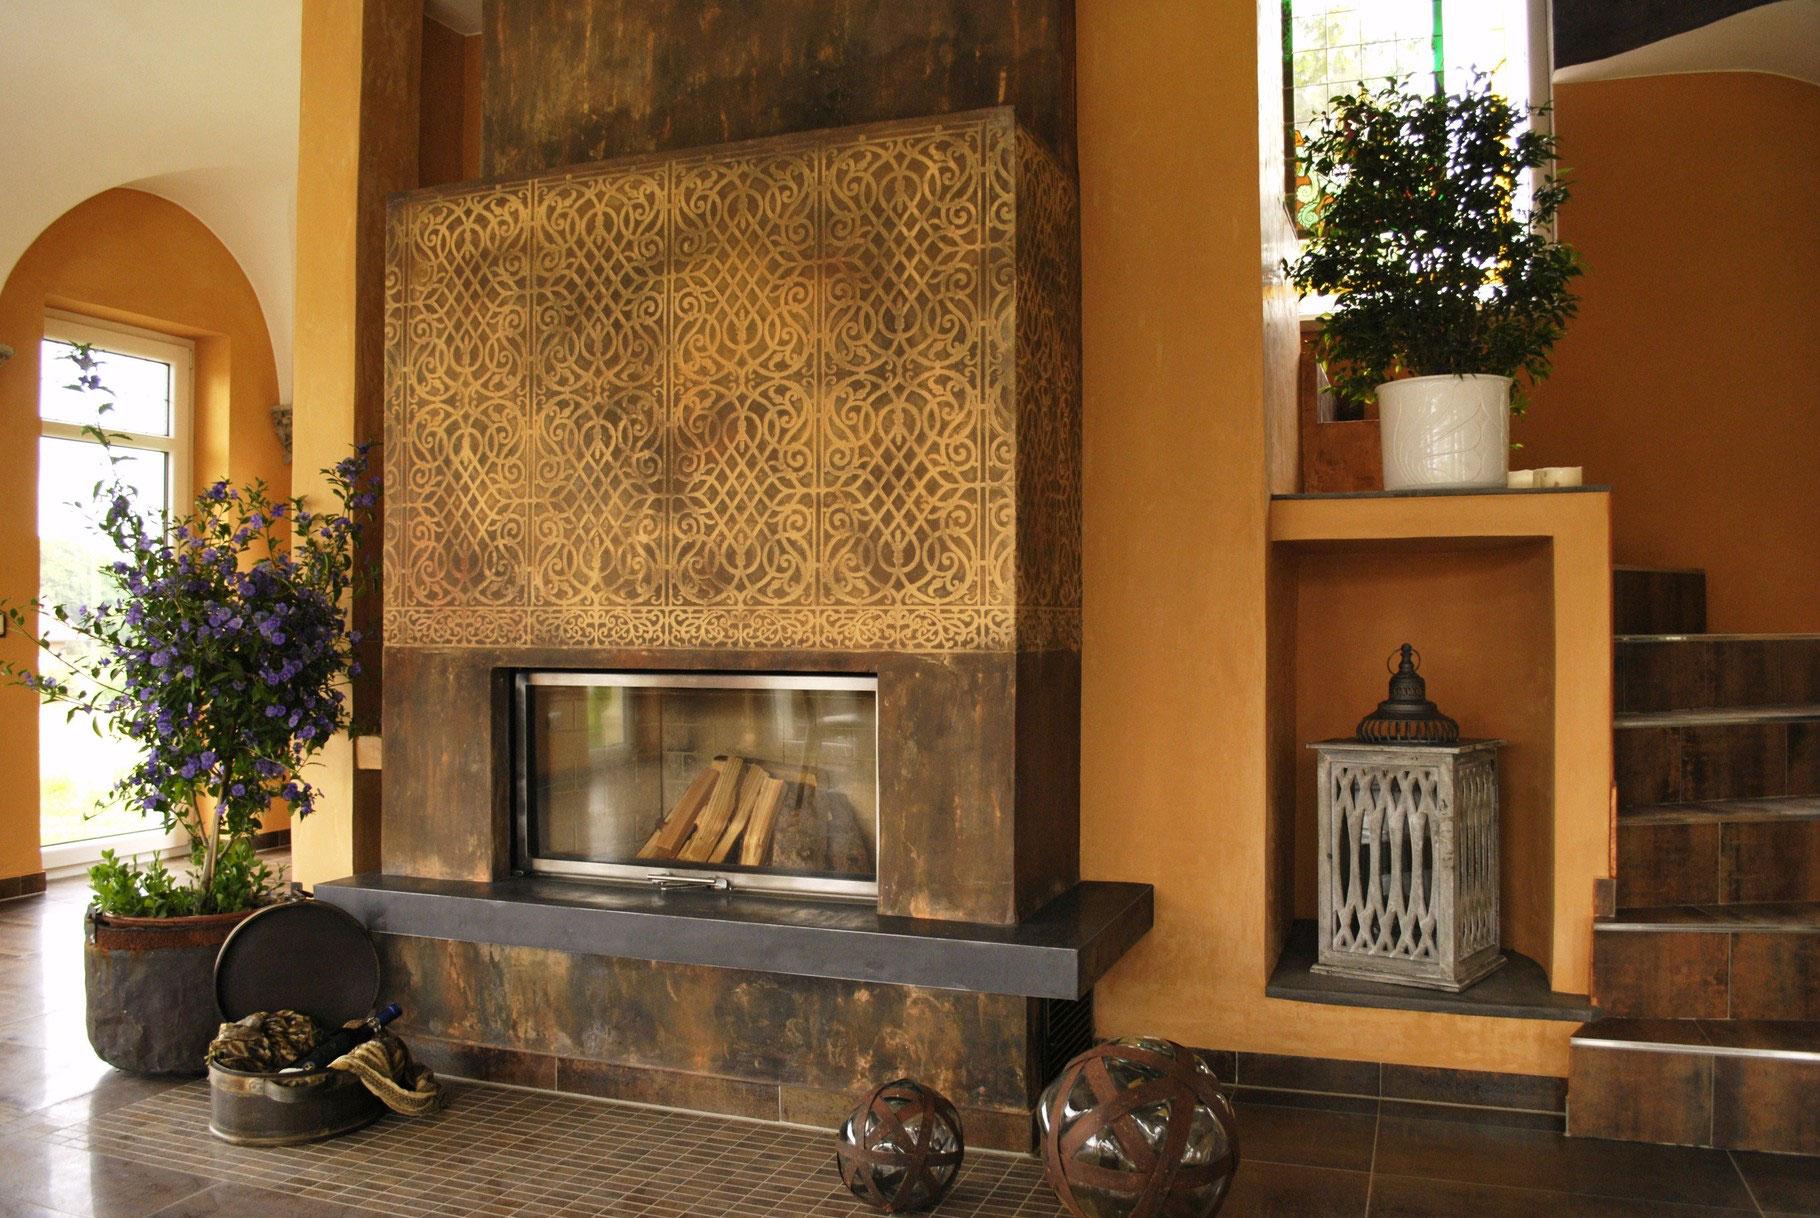 Kamin Design Wandgestaltung - stucco-decor - Kreative Spachteltechnik und Wandgestaltung